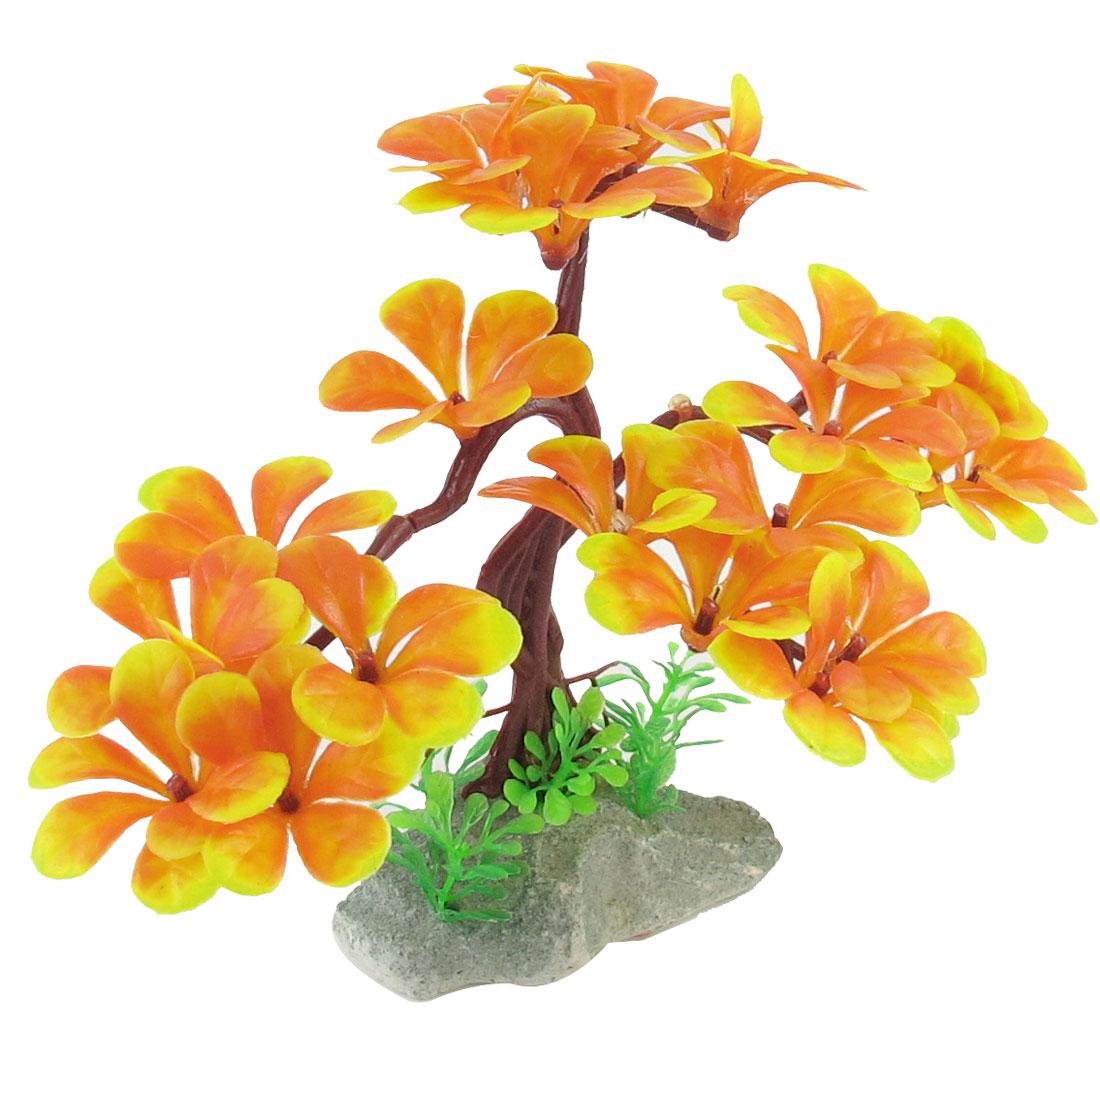 "5.3"" Height Plastic Yellow Orange Leaves Aquarium Underwater Tree Plants for Fish Tank"